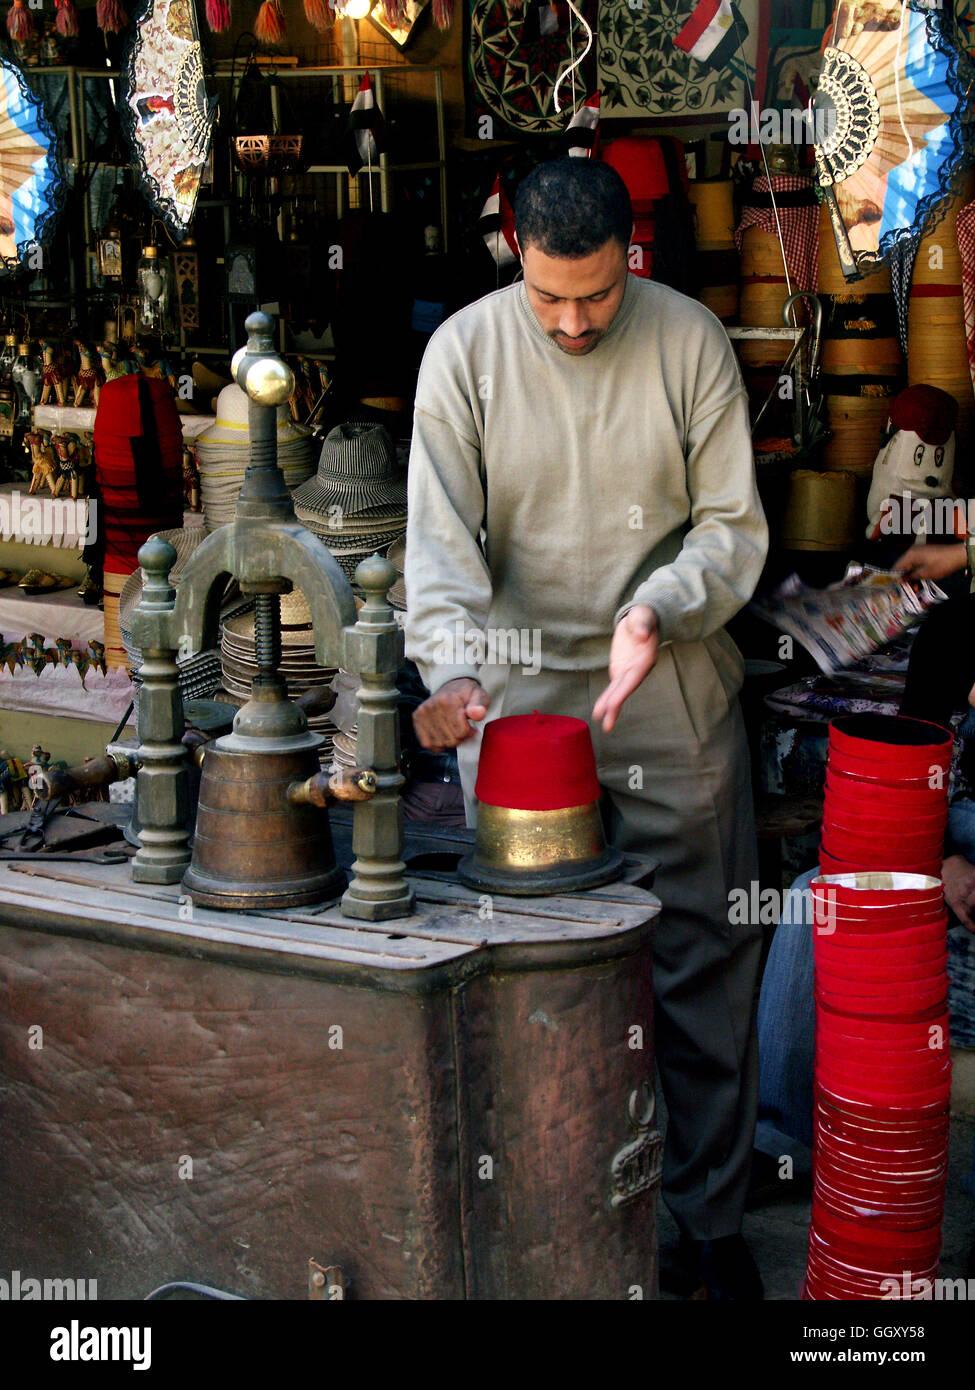 1f349b8c9 Egyptian Hats Stock Photos & Egyptian Hats Stock Images - Alamy